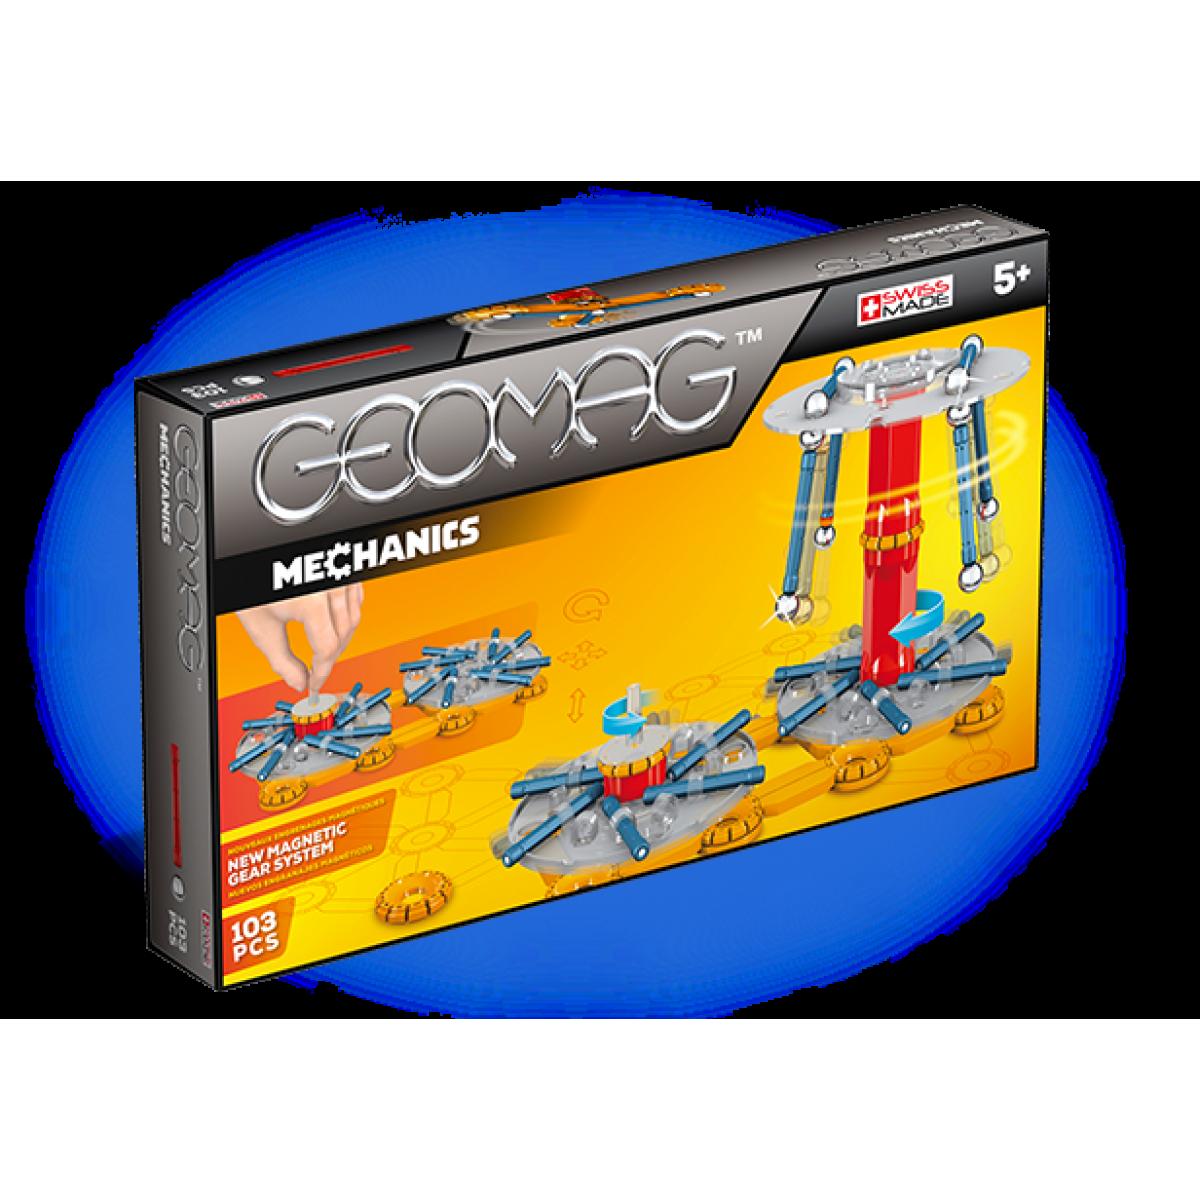 Geomag Mechanics 103 dílků